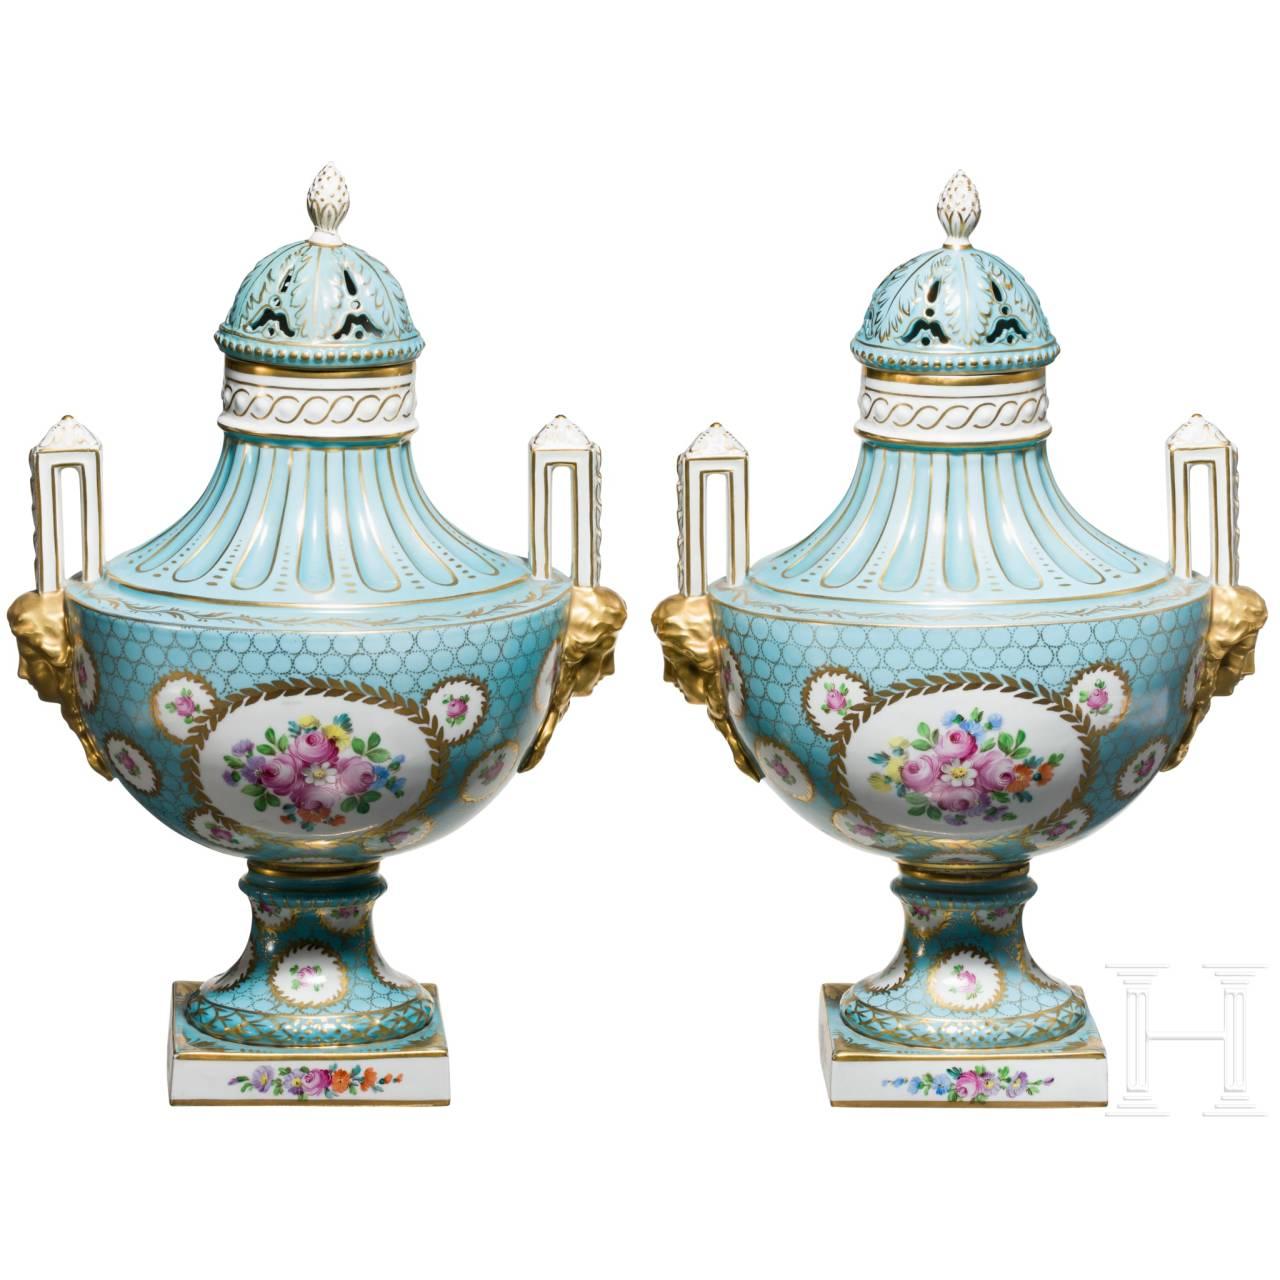 Two presentation vases, porcelain manufacture Dresden, 20th century